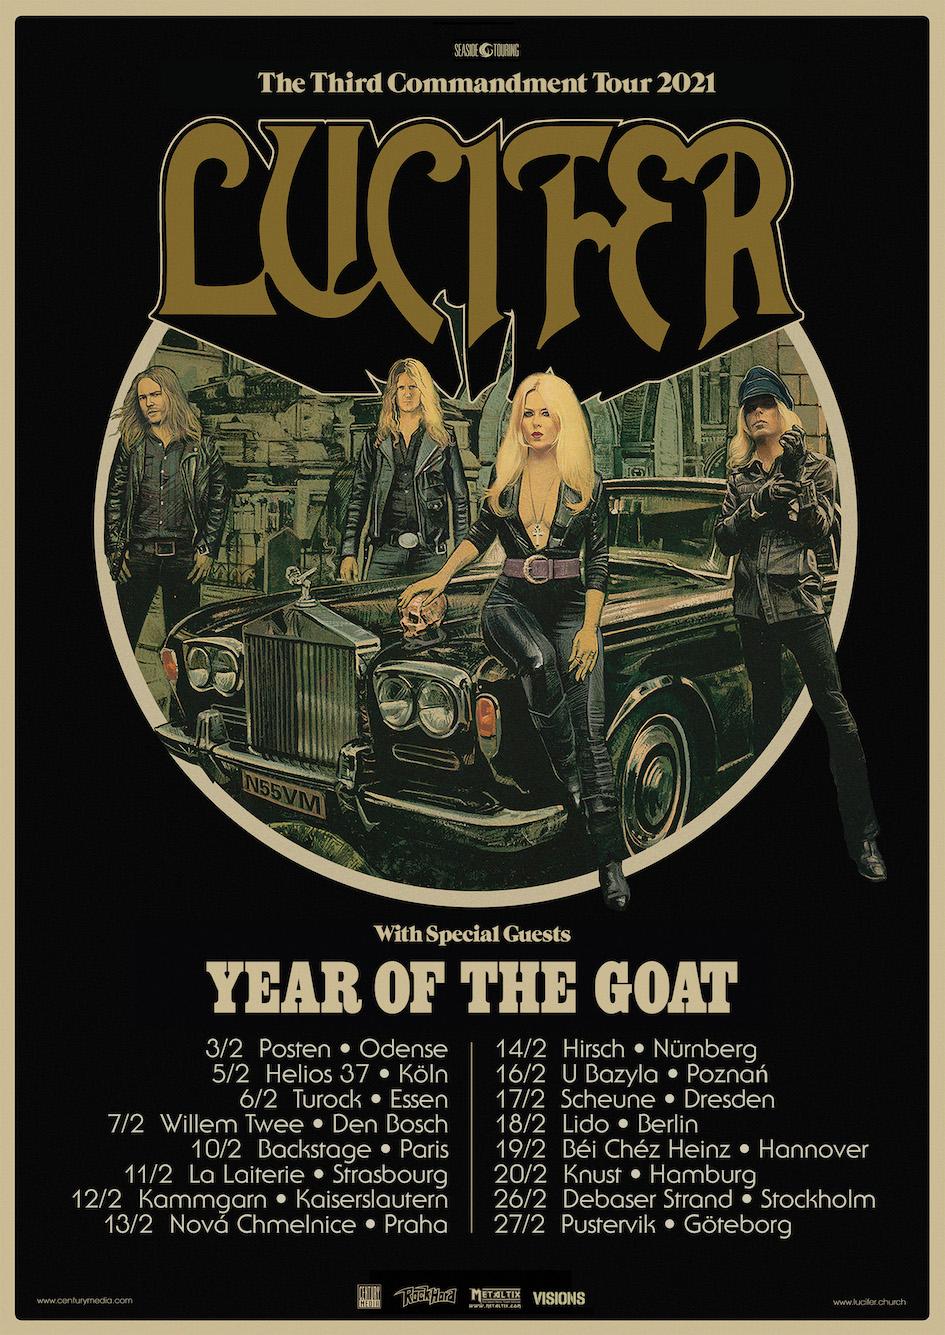 Lucifer The Thirs Commandment Tour 2021 Tourplakat